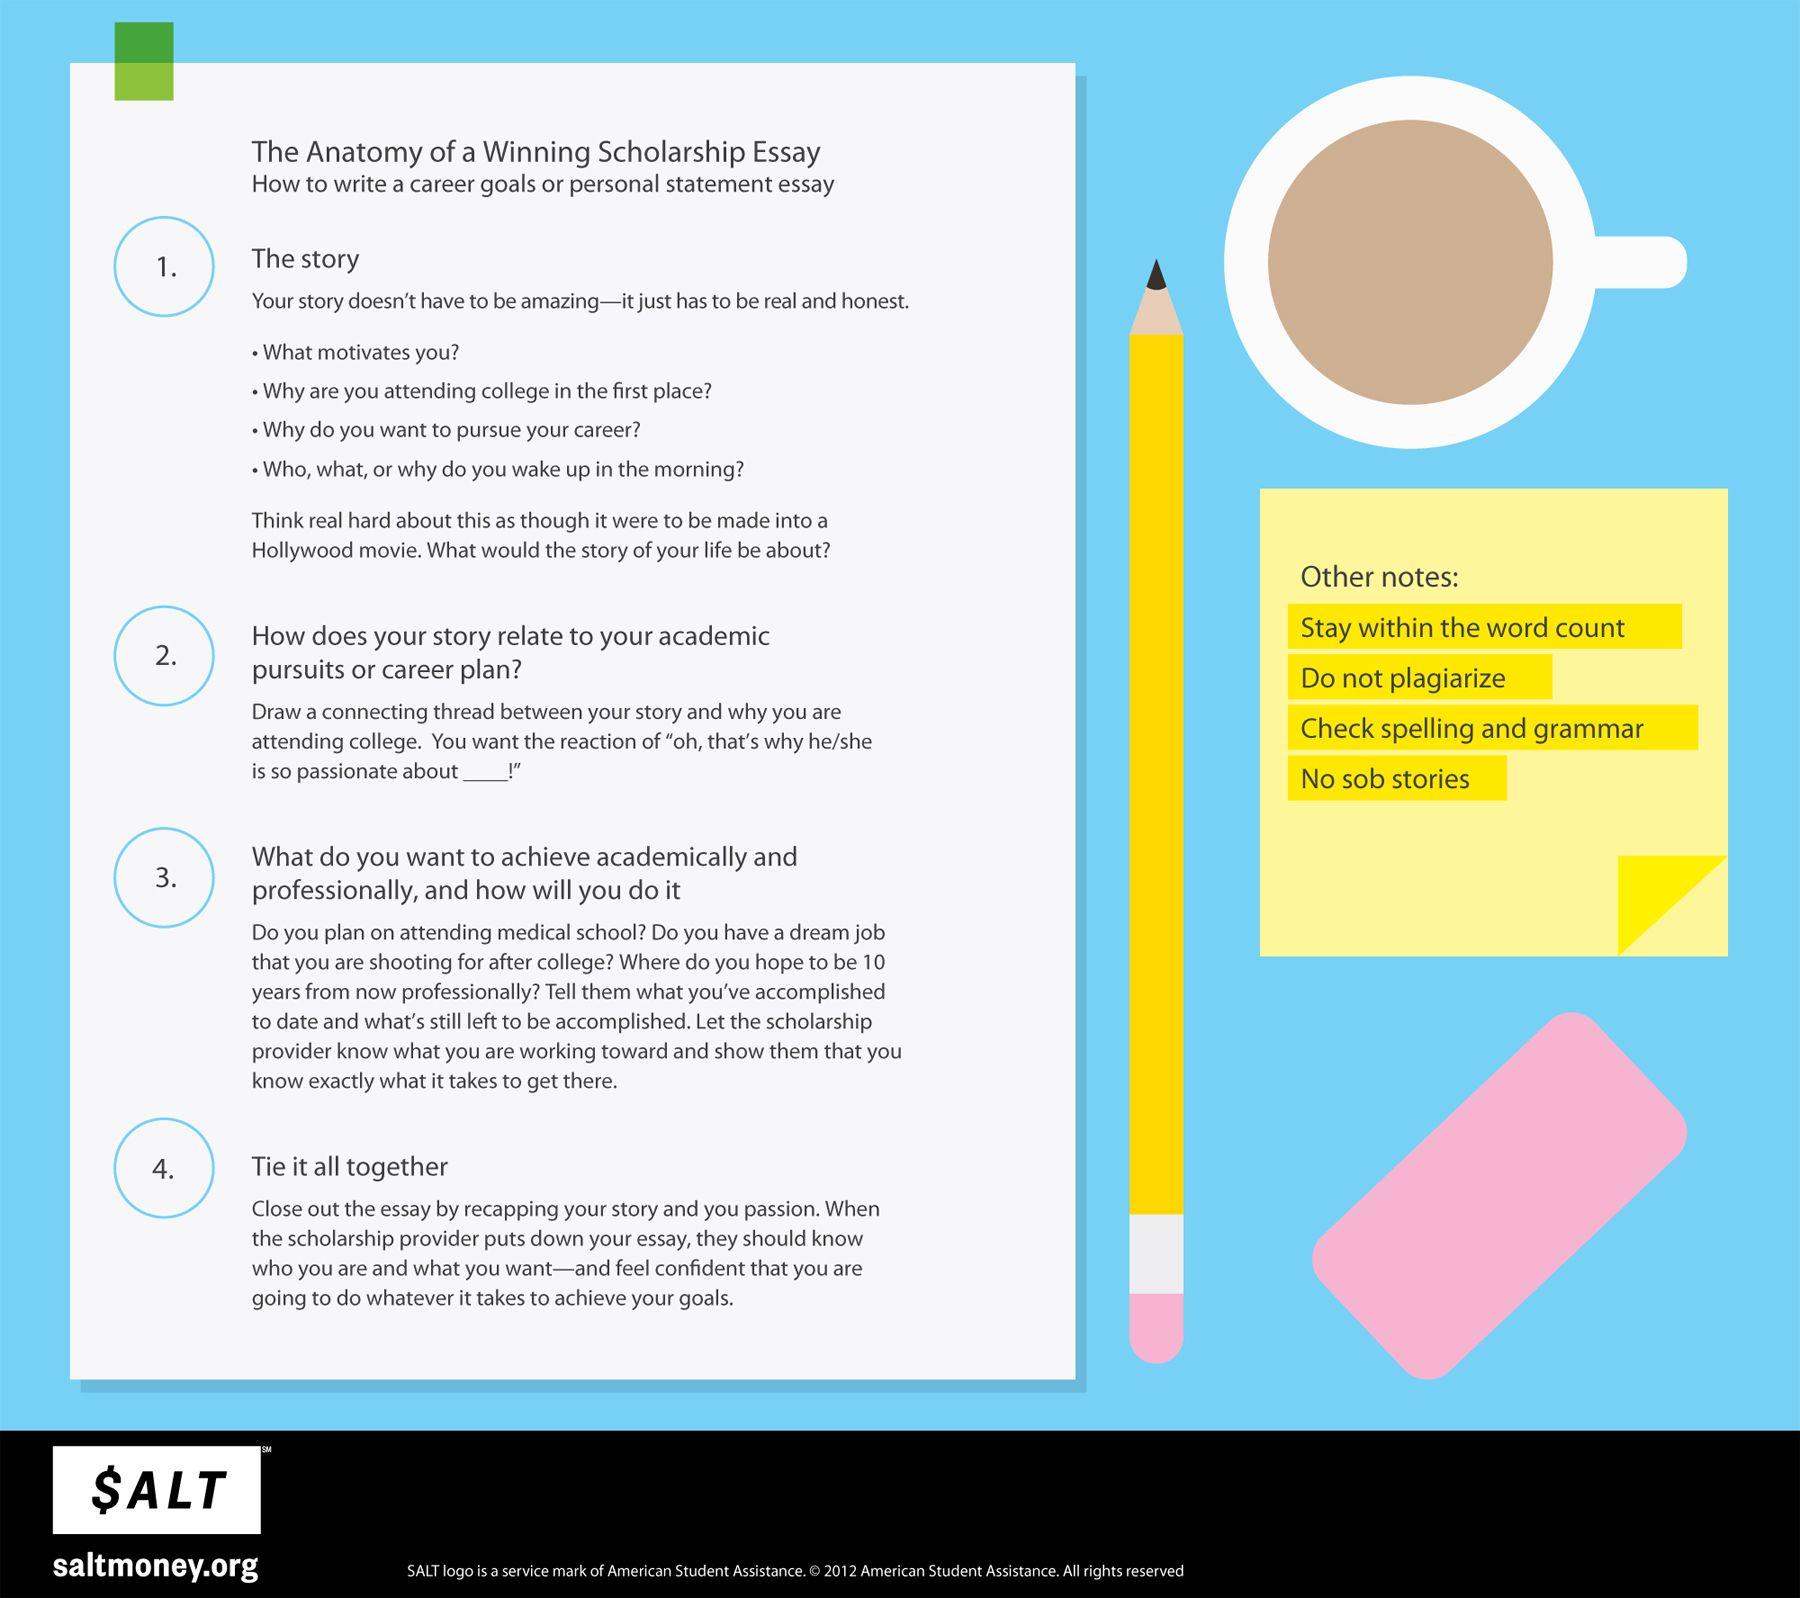 017 Scholarship Essay Tips Example Singular Gilman Psc Goldwater Full